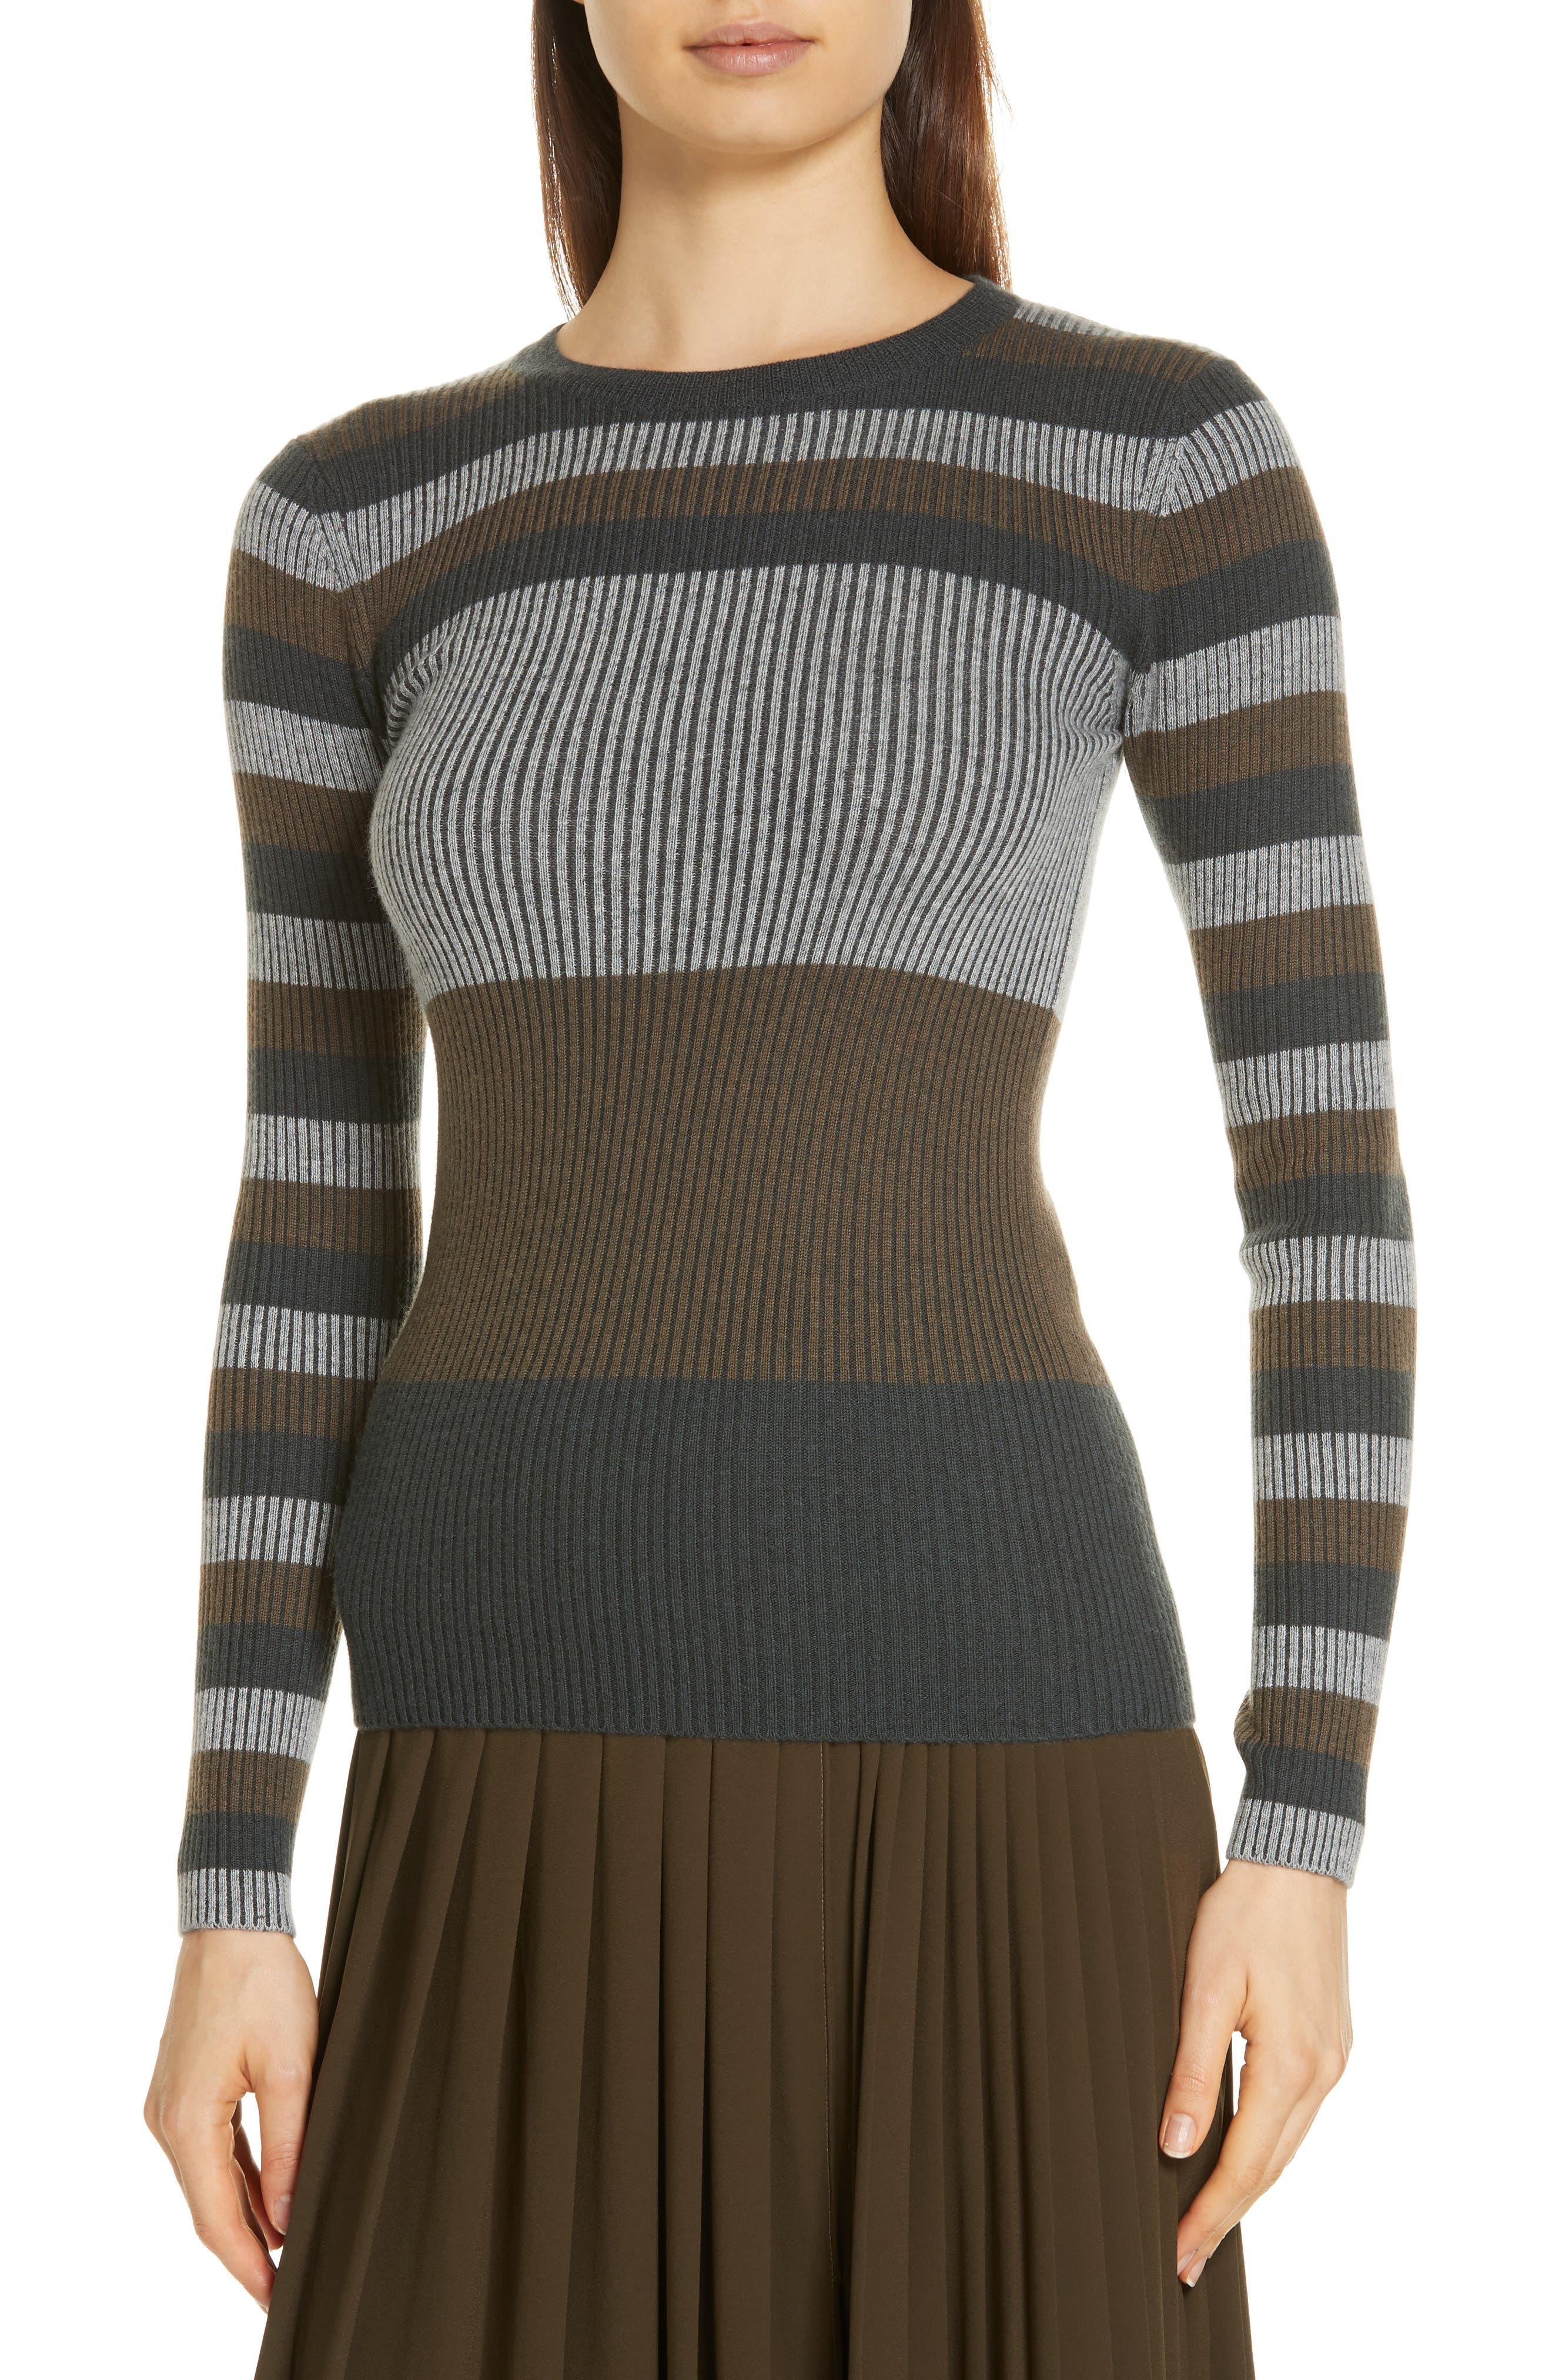 NORDSTROM SIGNATURE,                             Stripe Cashmere Sweater,                             Alternate thumbnail 4, color,                             315